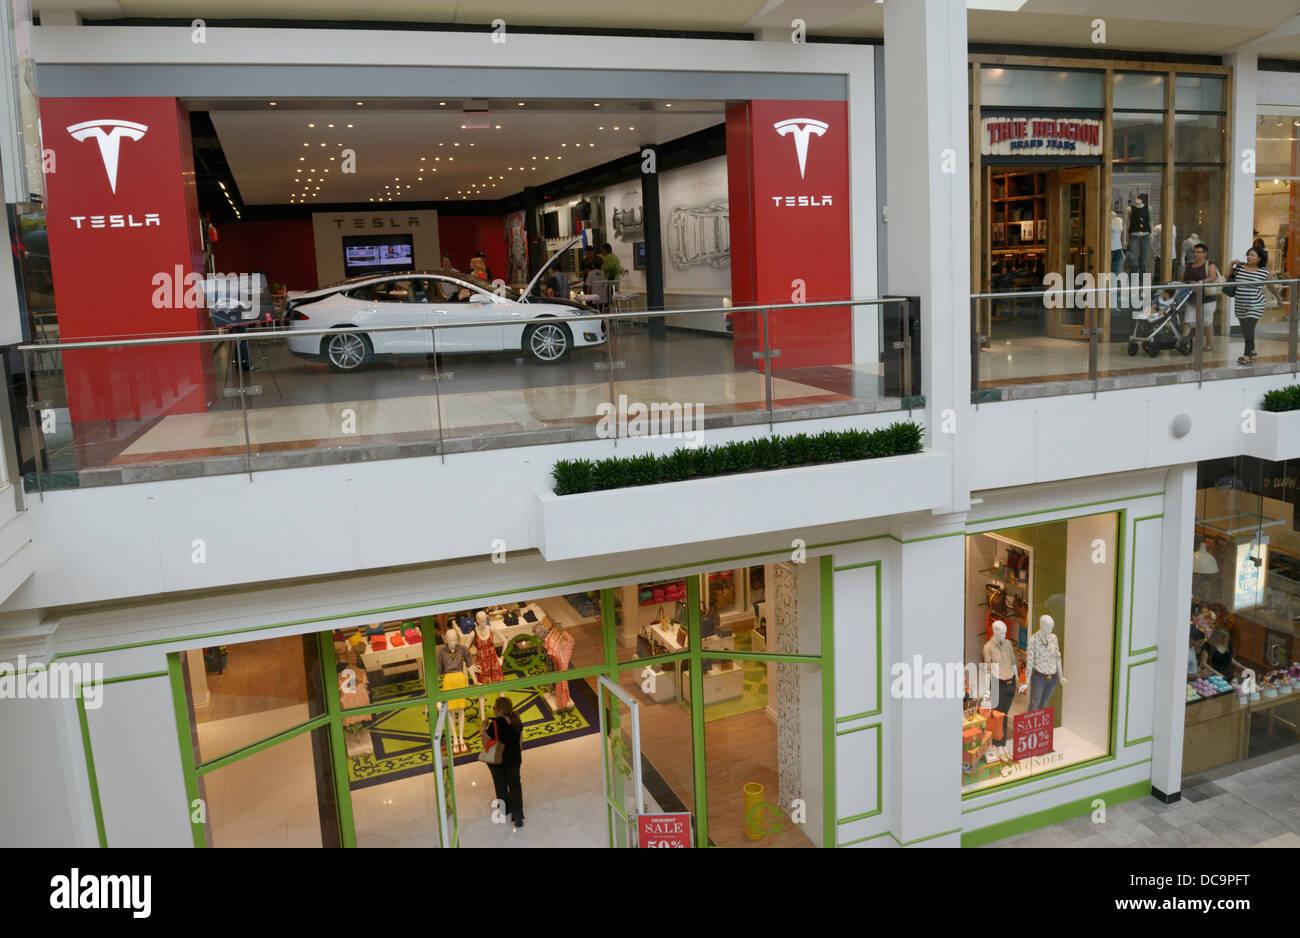 Tesla Elektro-Auto-Händler (Ladengeschäft) in eine Shopping-Mall, NJ, USA Stockbild